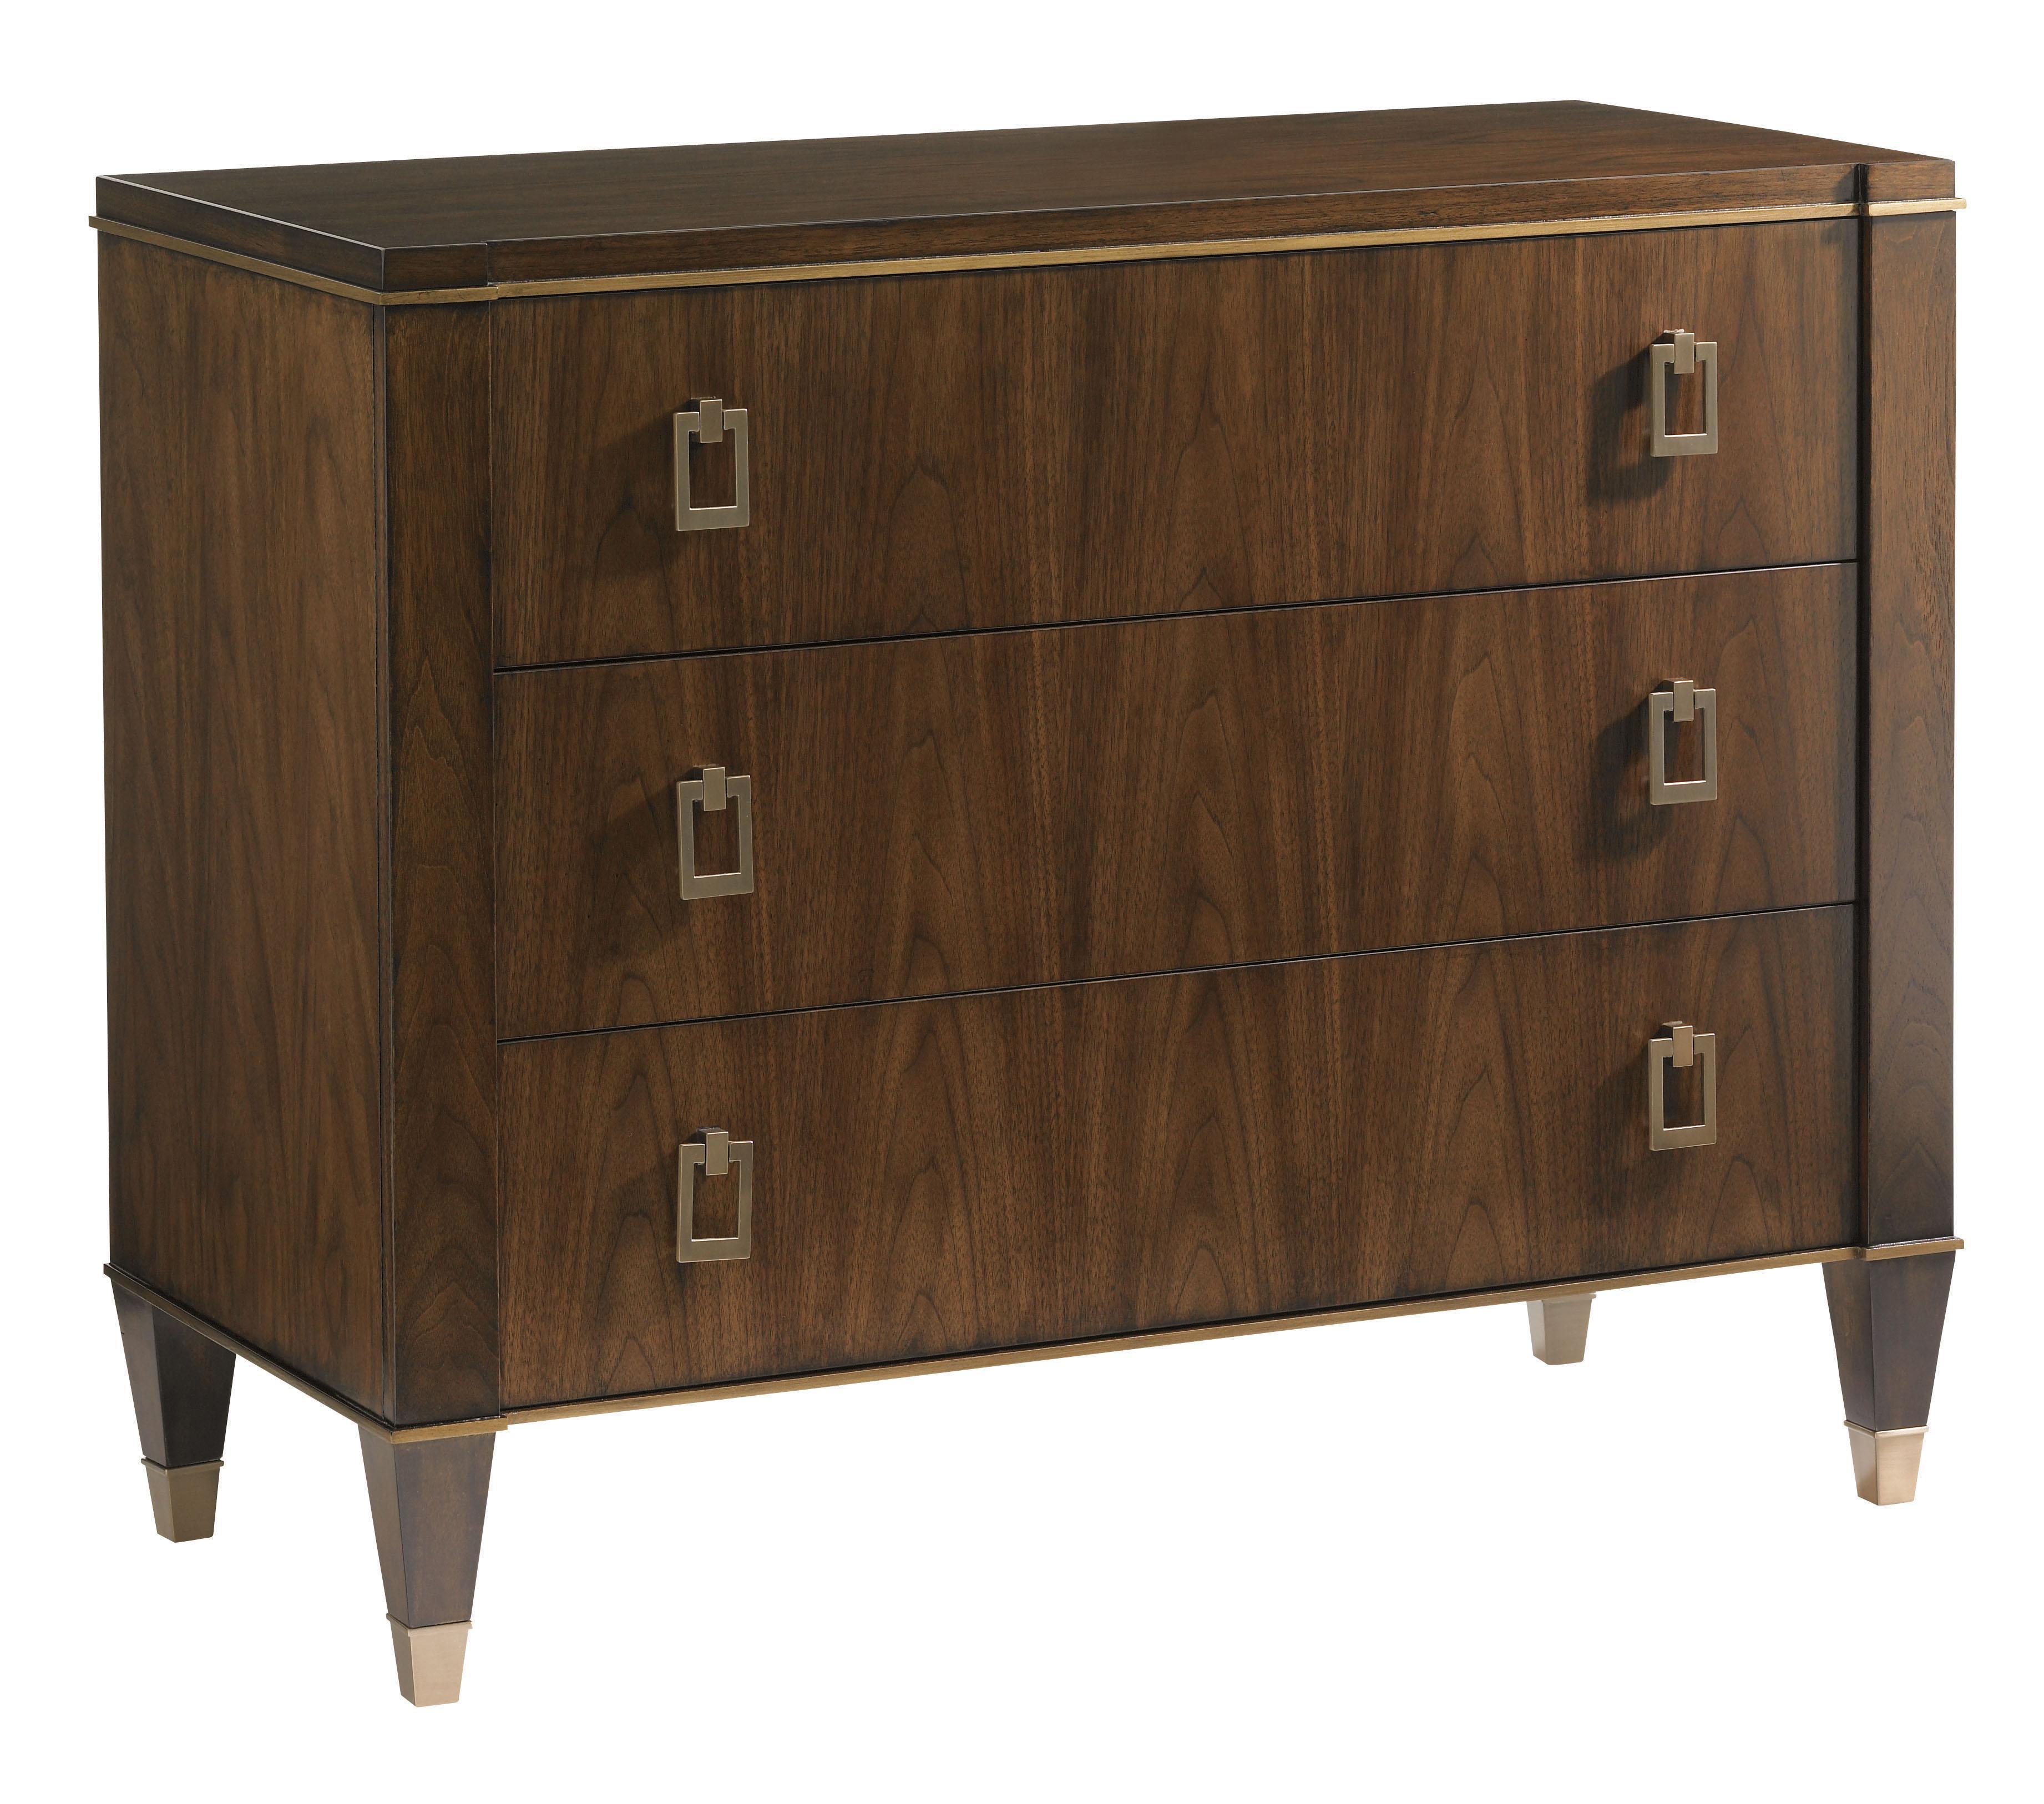 Tower Place Evanston Single Dresser by Lexington at Baer's Furniture